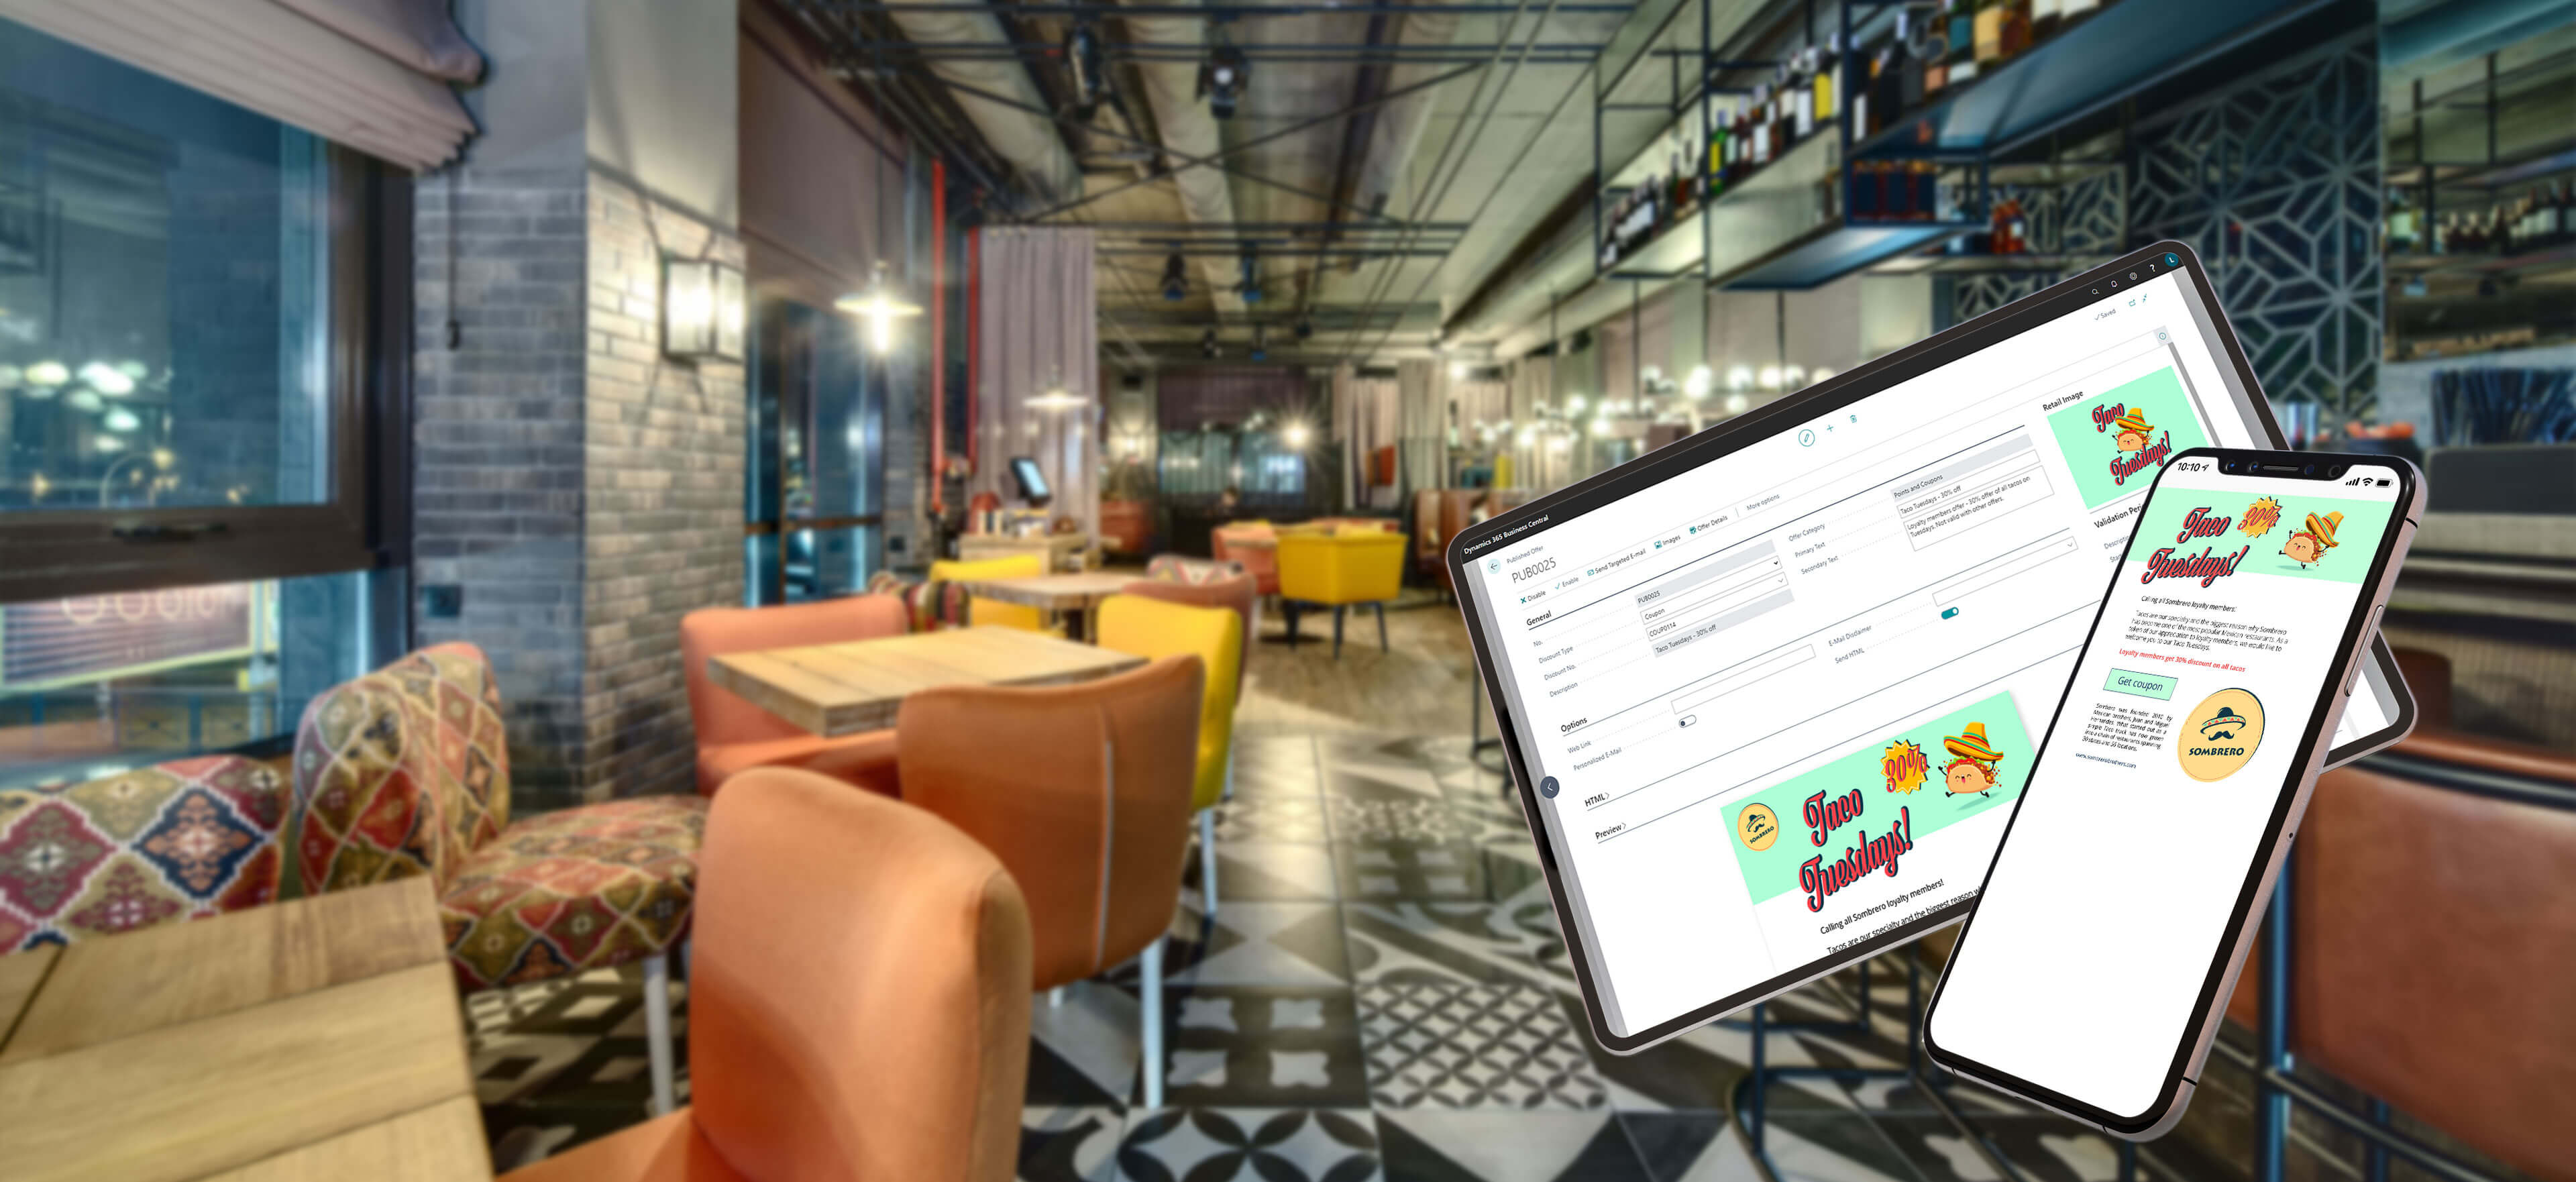 LS-Central-for-restaurants-guest-loyalty-header